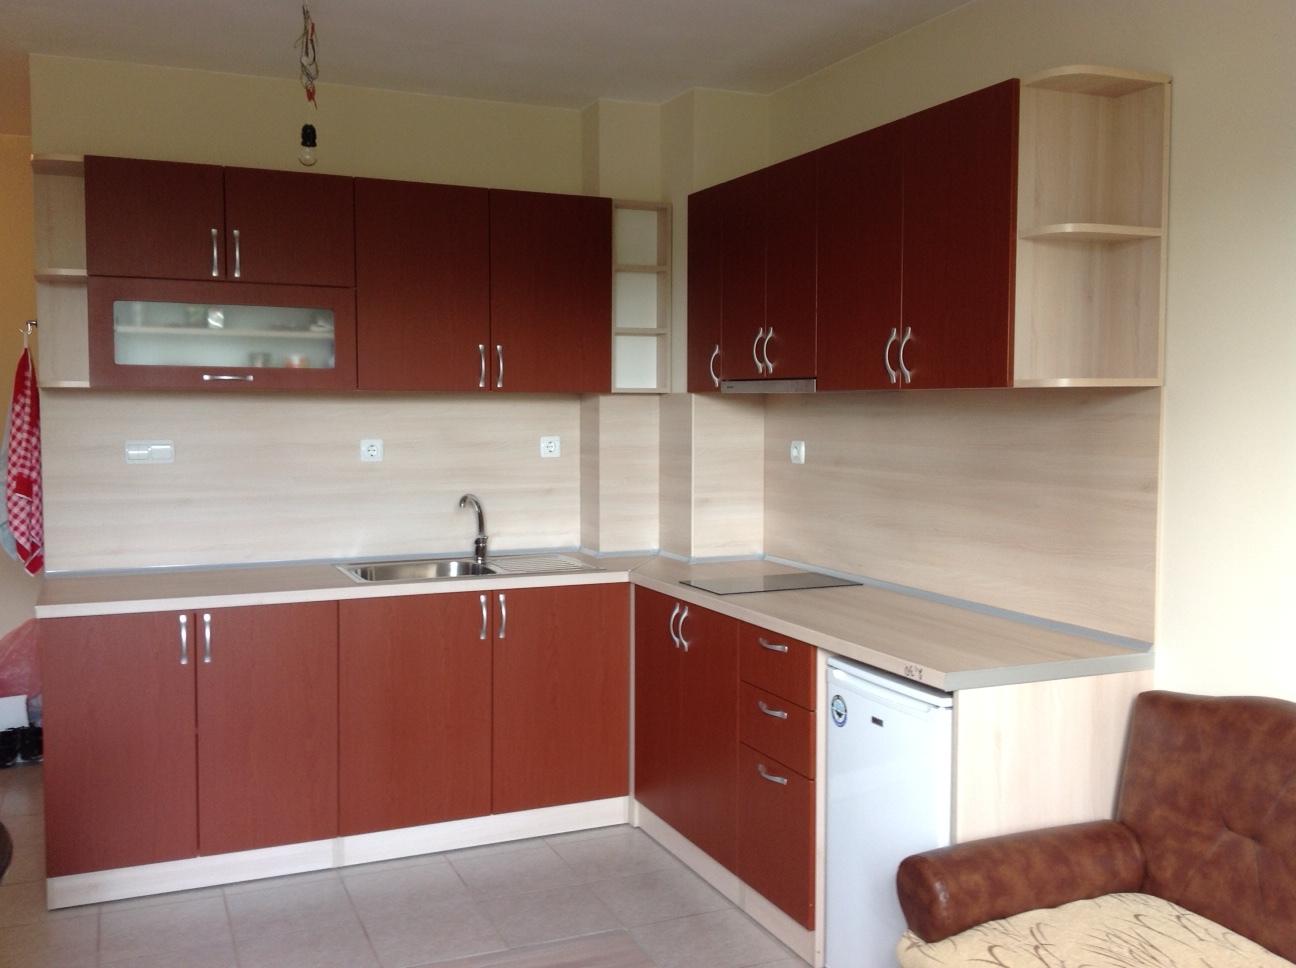 Кухня с мембранни врати